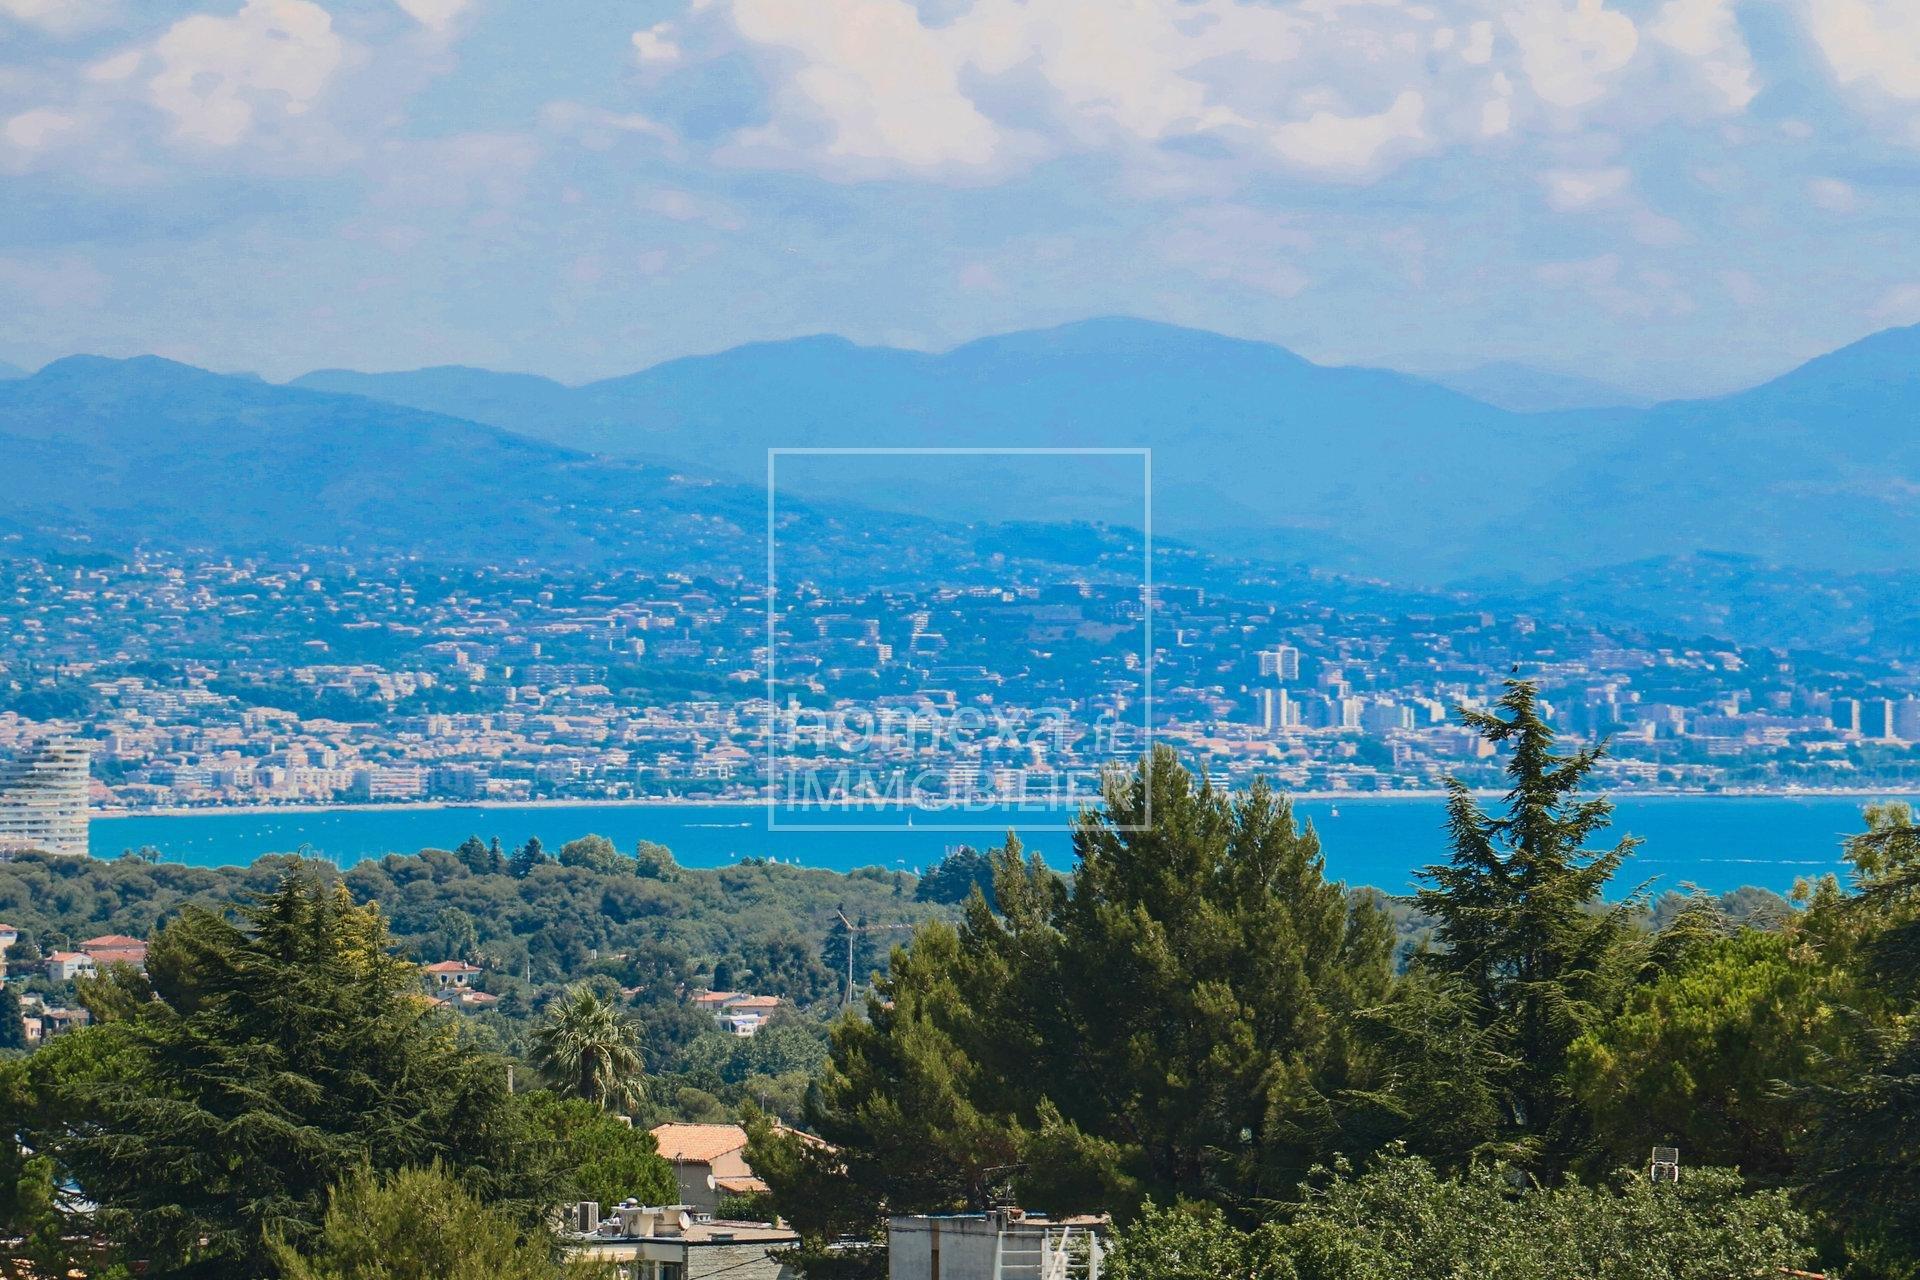 Villa Antibes constance à vendre :  vue mer